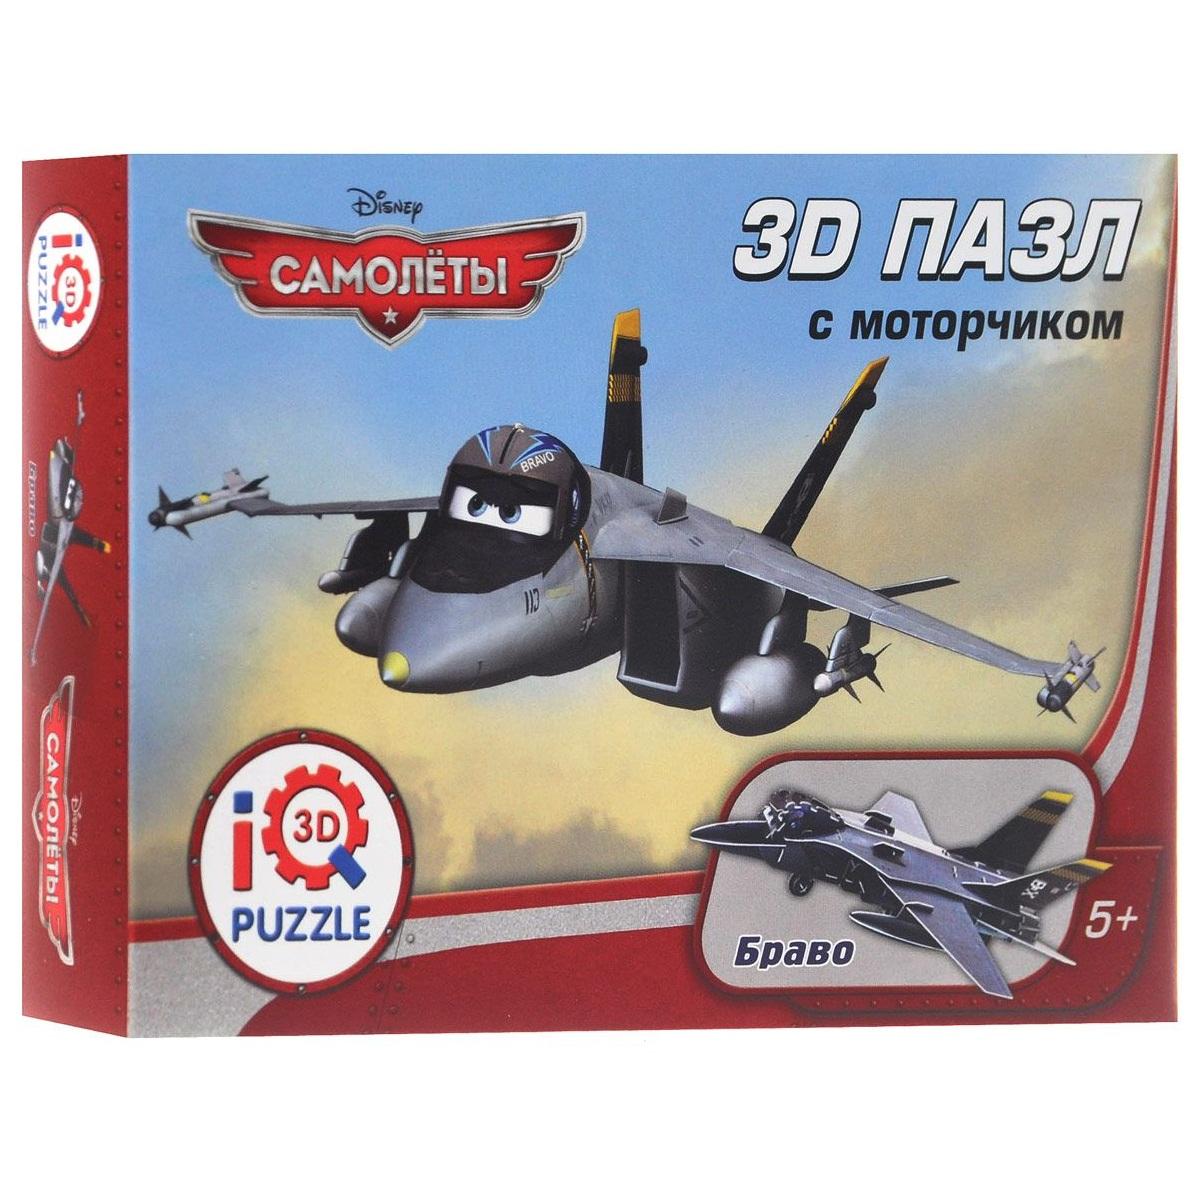 3D пазл Disney Самолеты – Браво, инерционныйПазлы объёмные 3D<br>3D пазл Disney Самолеты – Браво, инерционный<br>